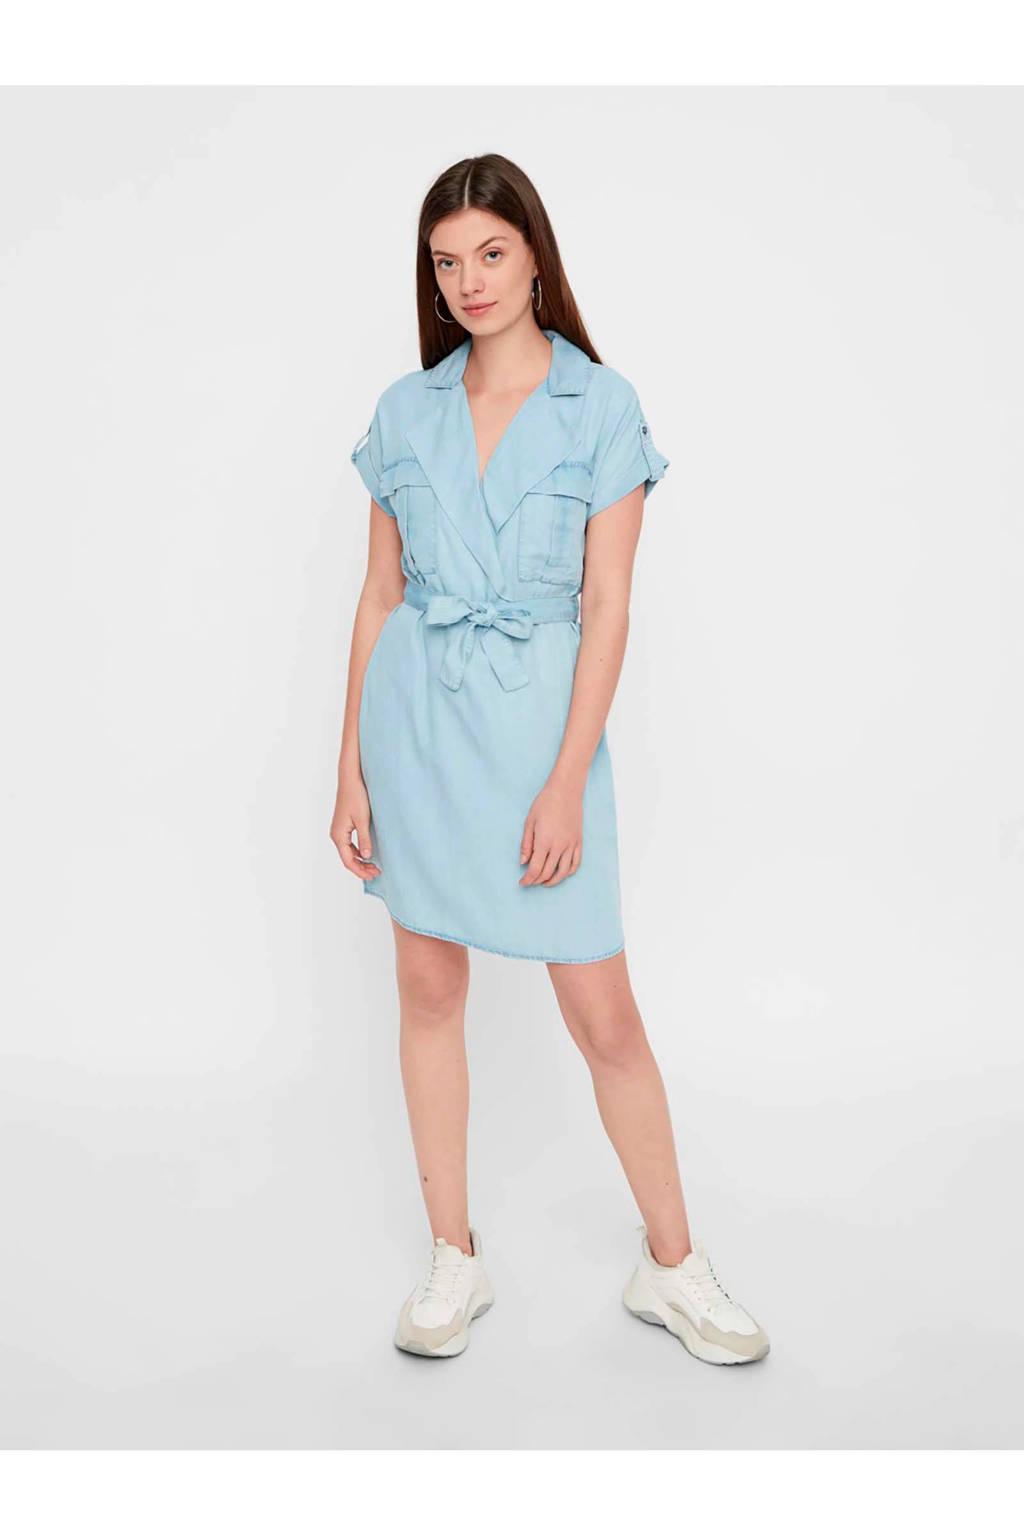 NOISY MAY jurk lichtblauw, Light denim